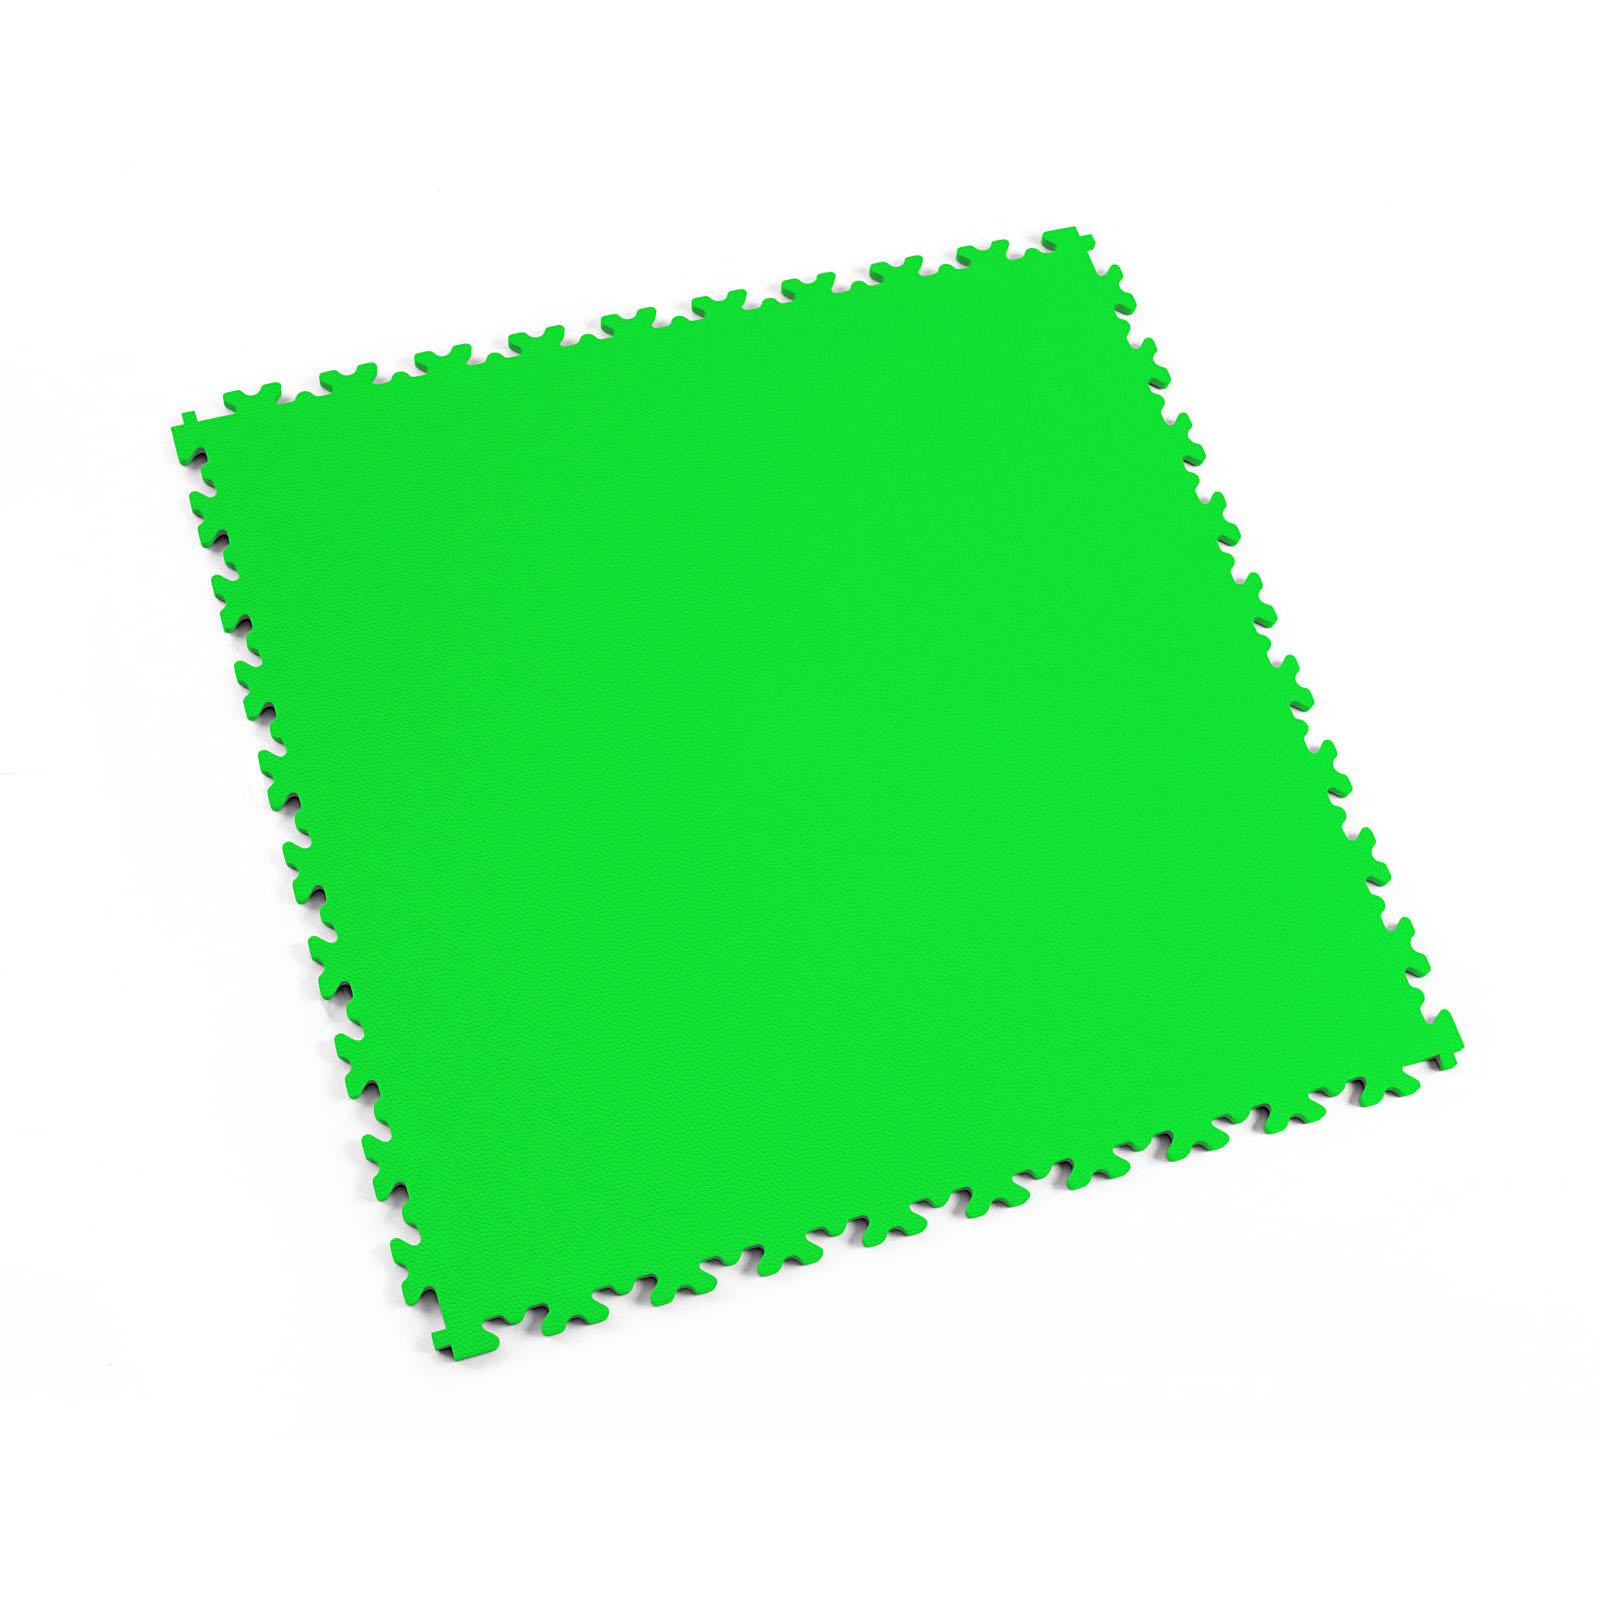 pvc-fliese-boden-platte-jp-mechanic-lightgrün-lederstruktur-industrie-mechanik